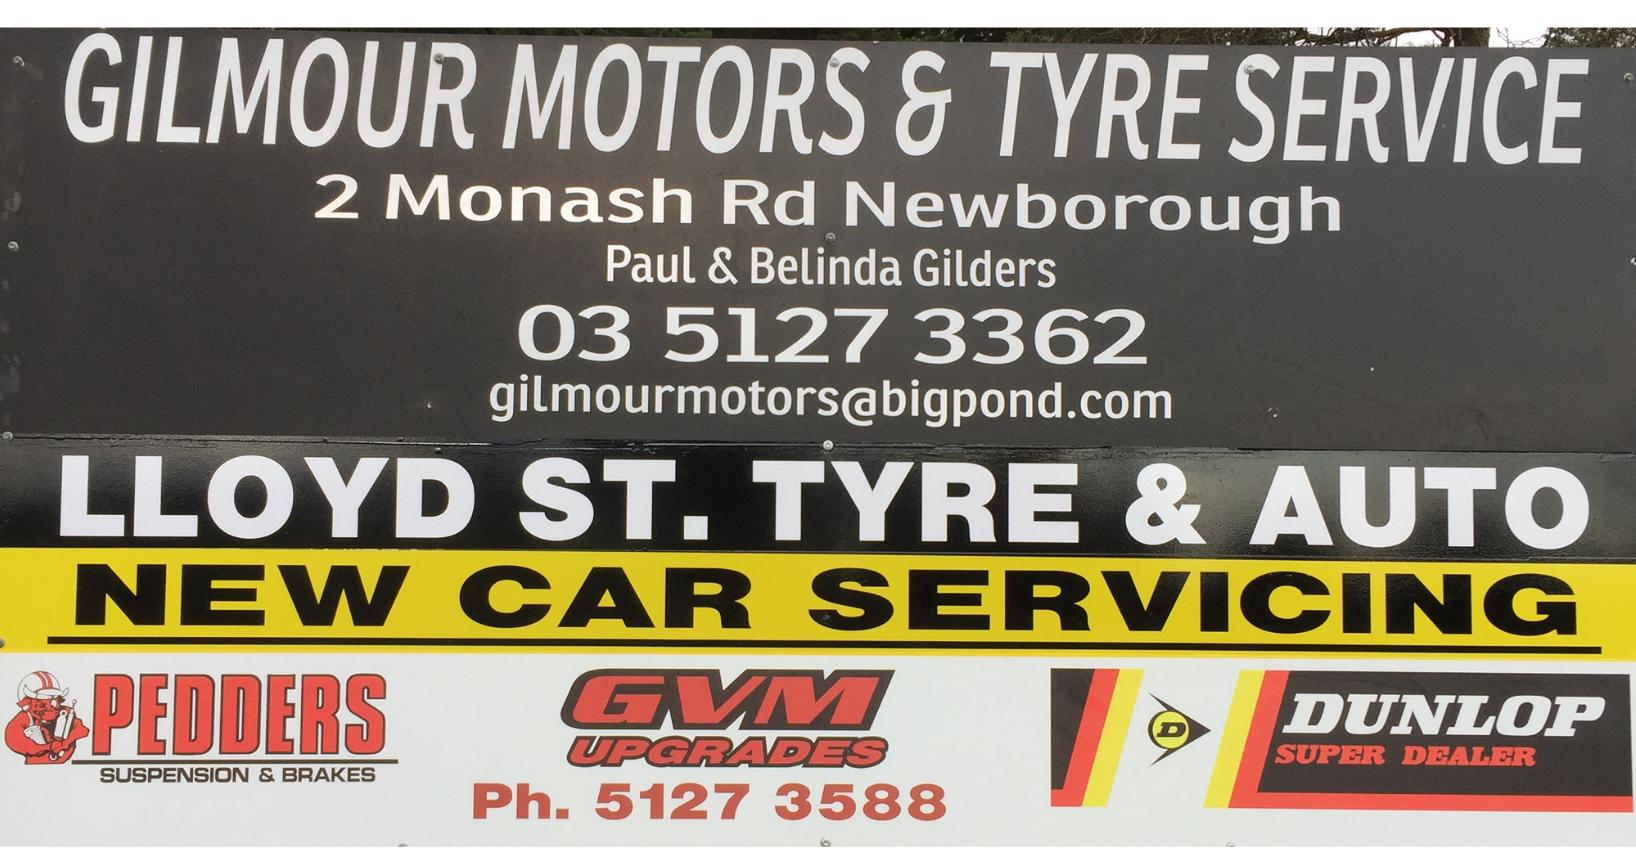 gilmour tyres car parking sponsor (2)